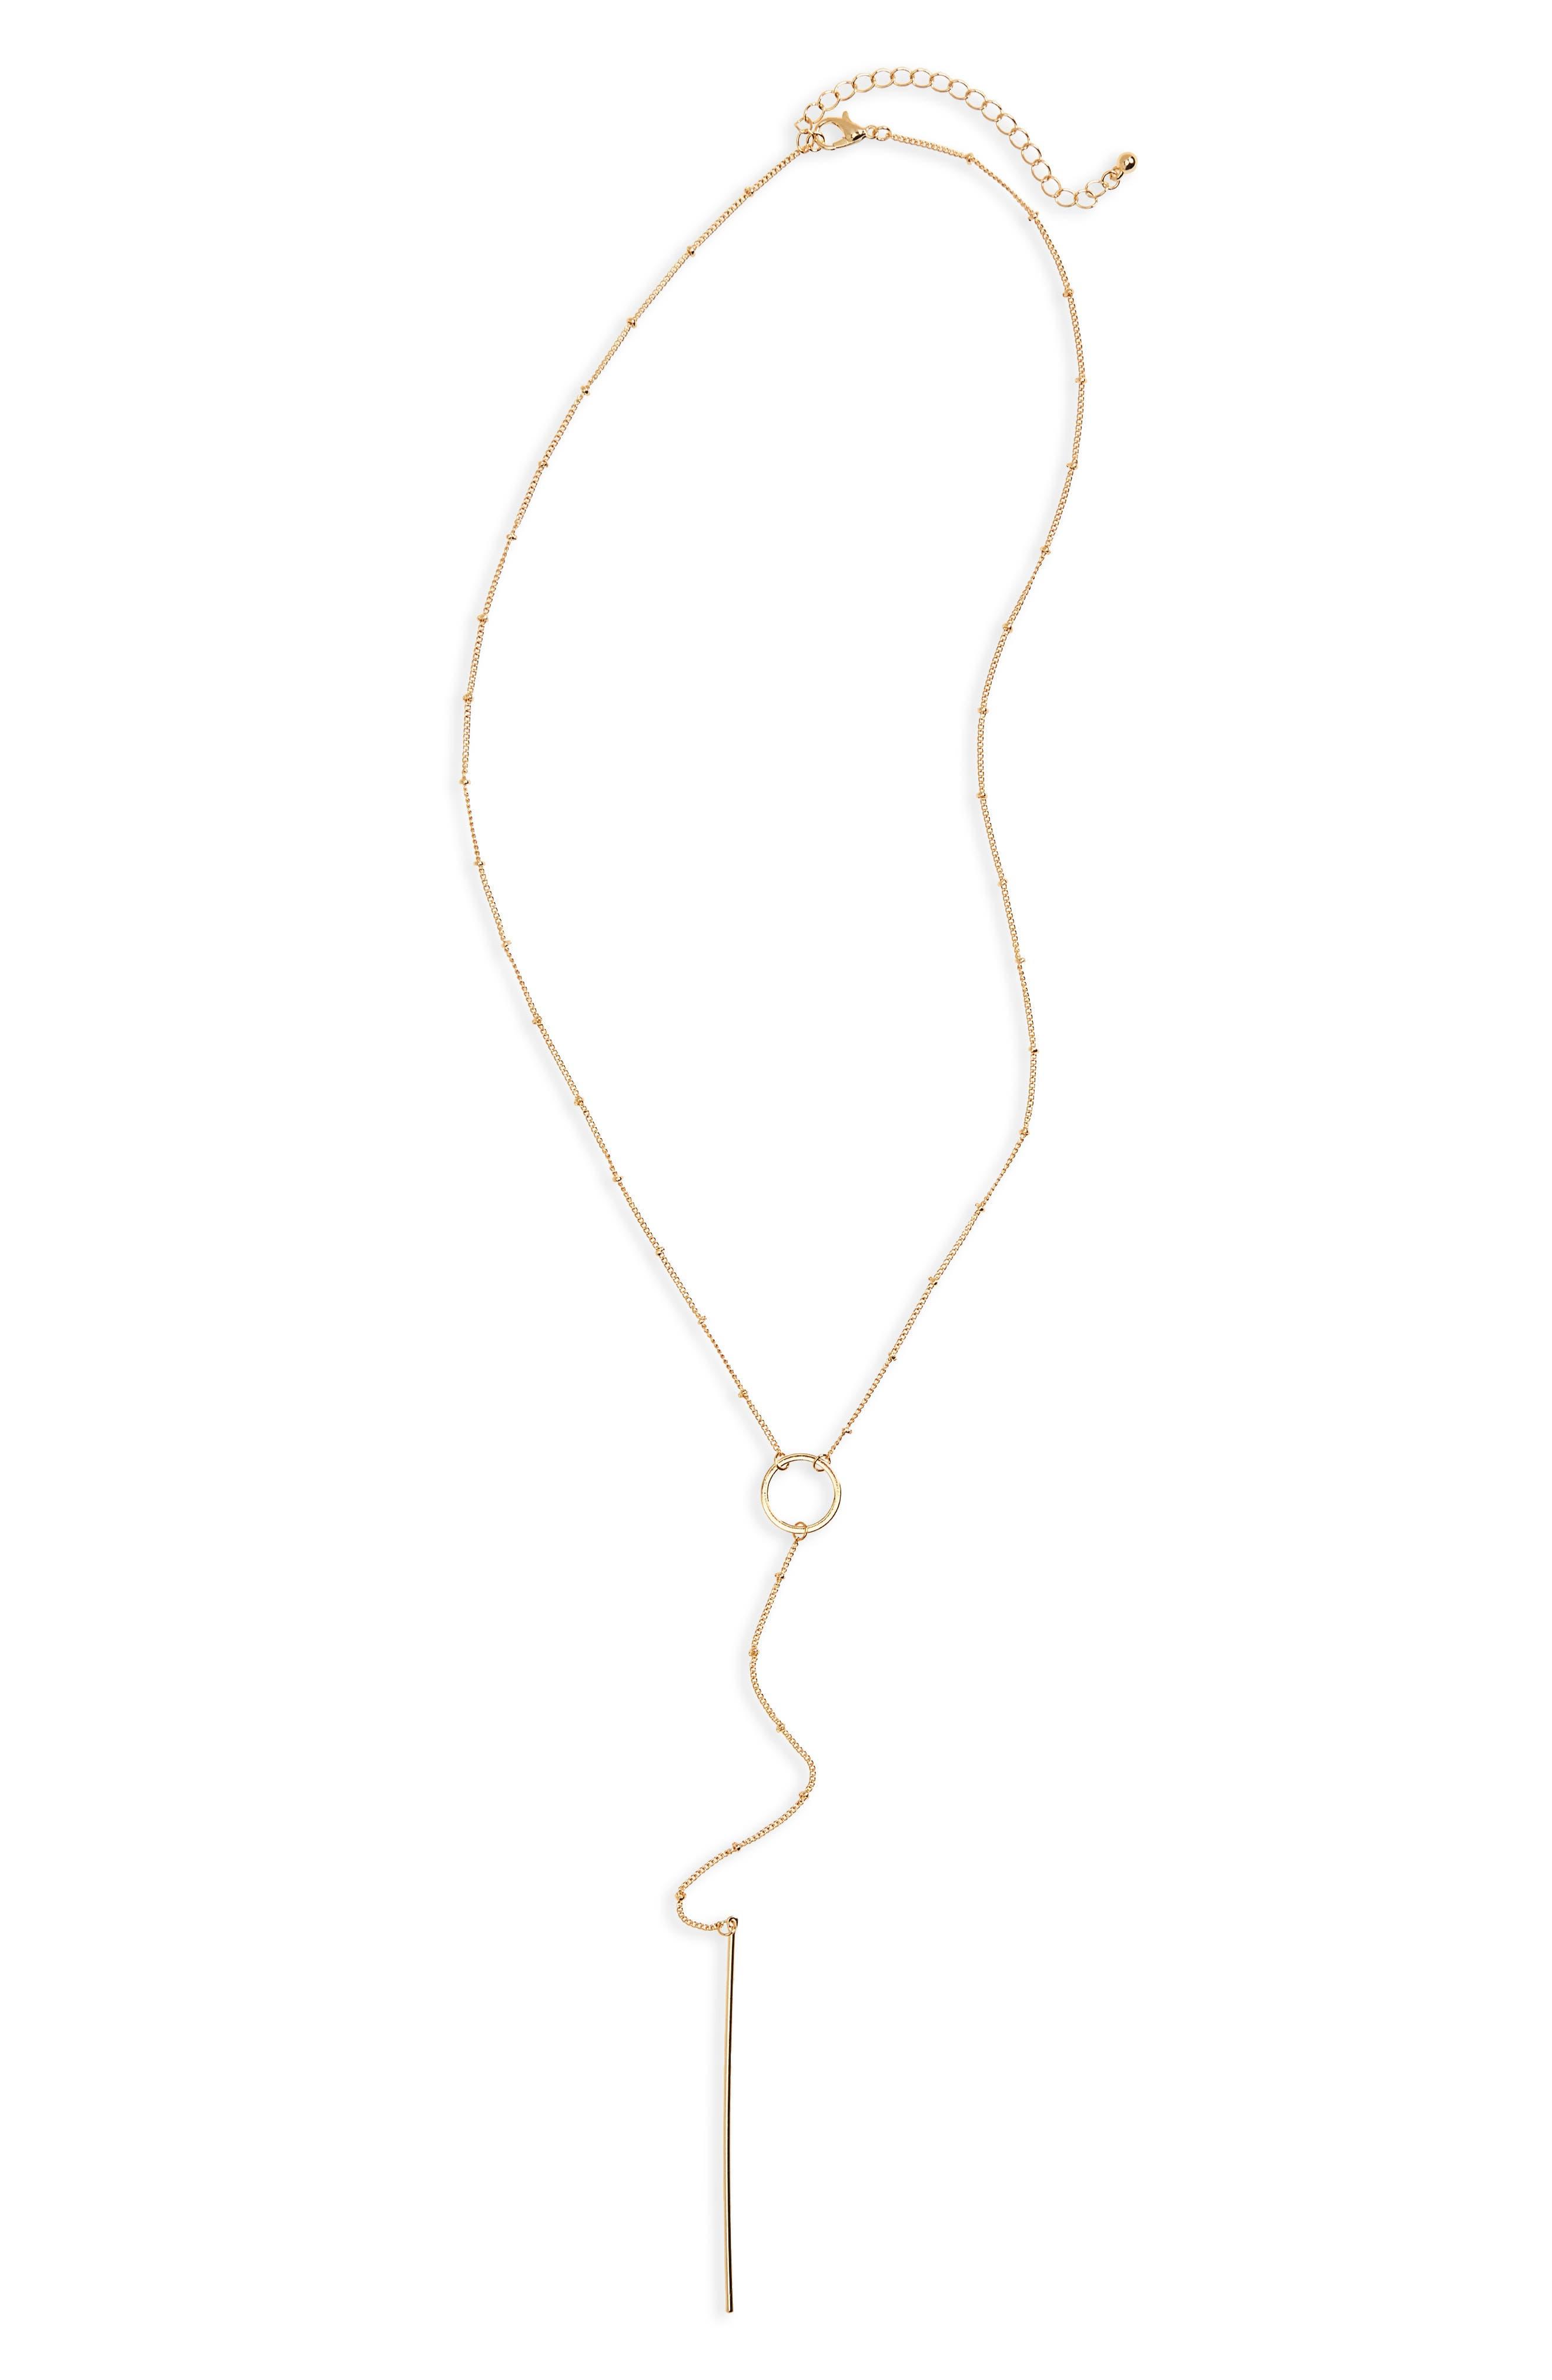 Alternate Image 1 Selected - BP. Circle Bar Lariat Necklace